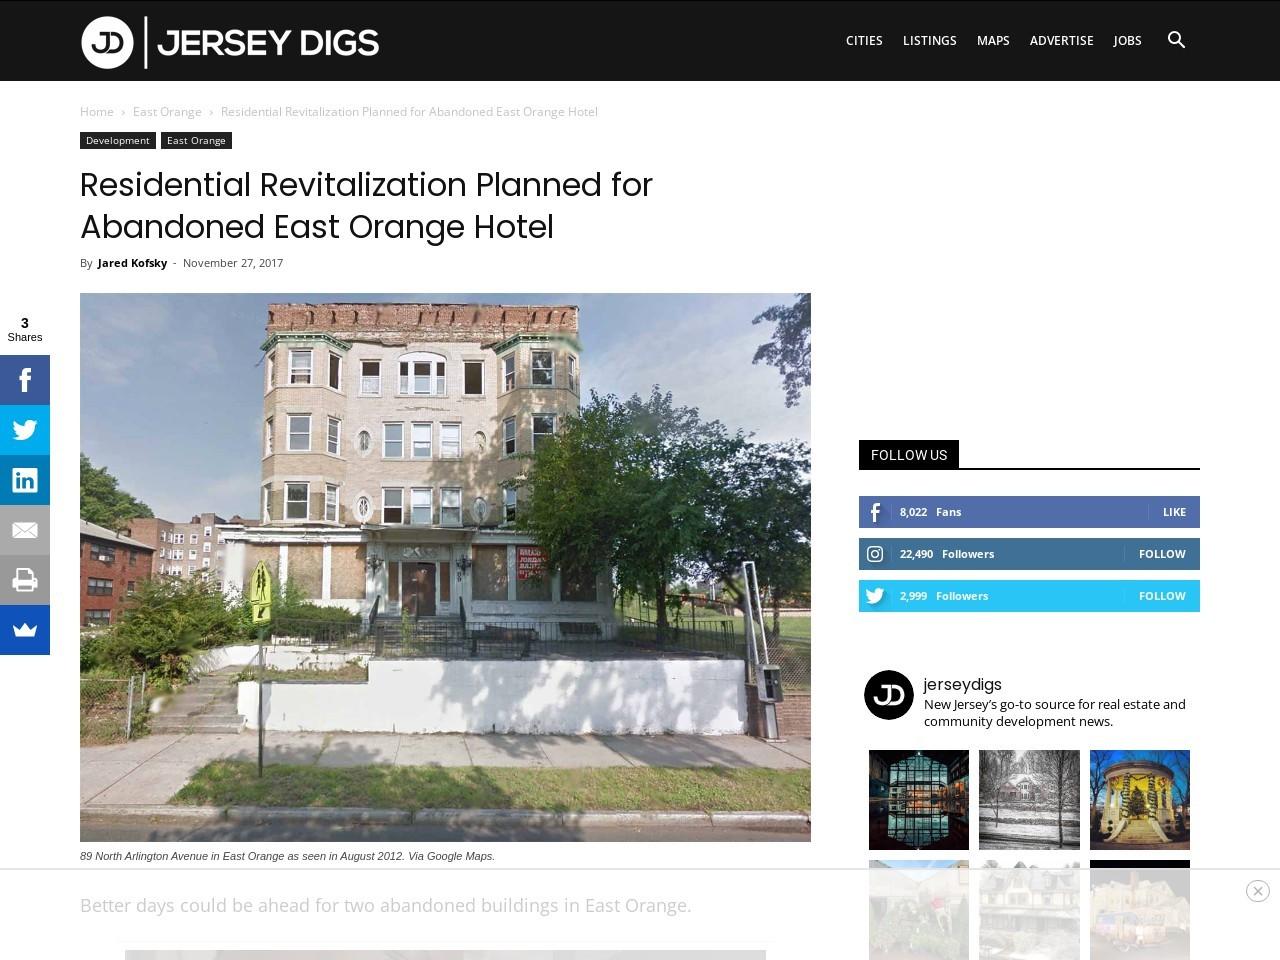 Residential Revitalization Planned for Abandoned East Orange Hotel